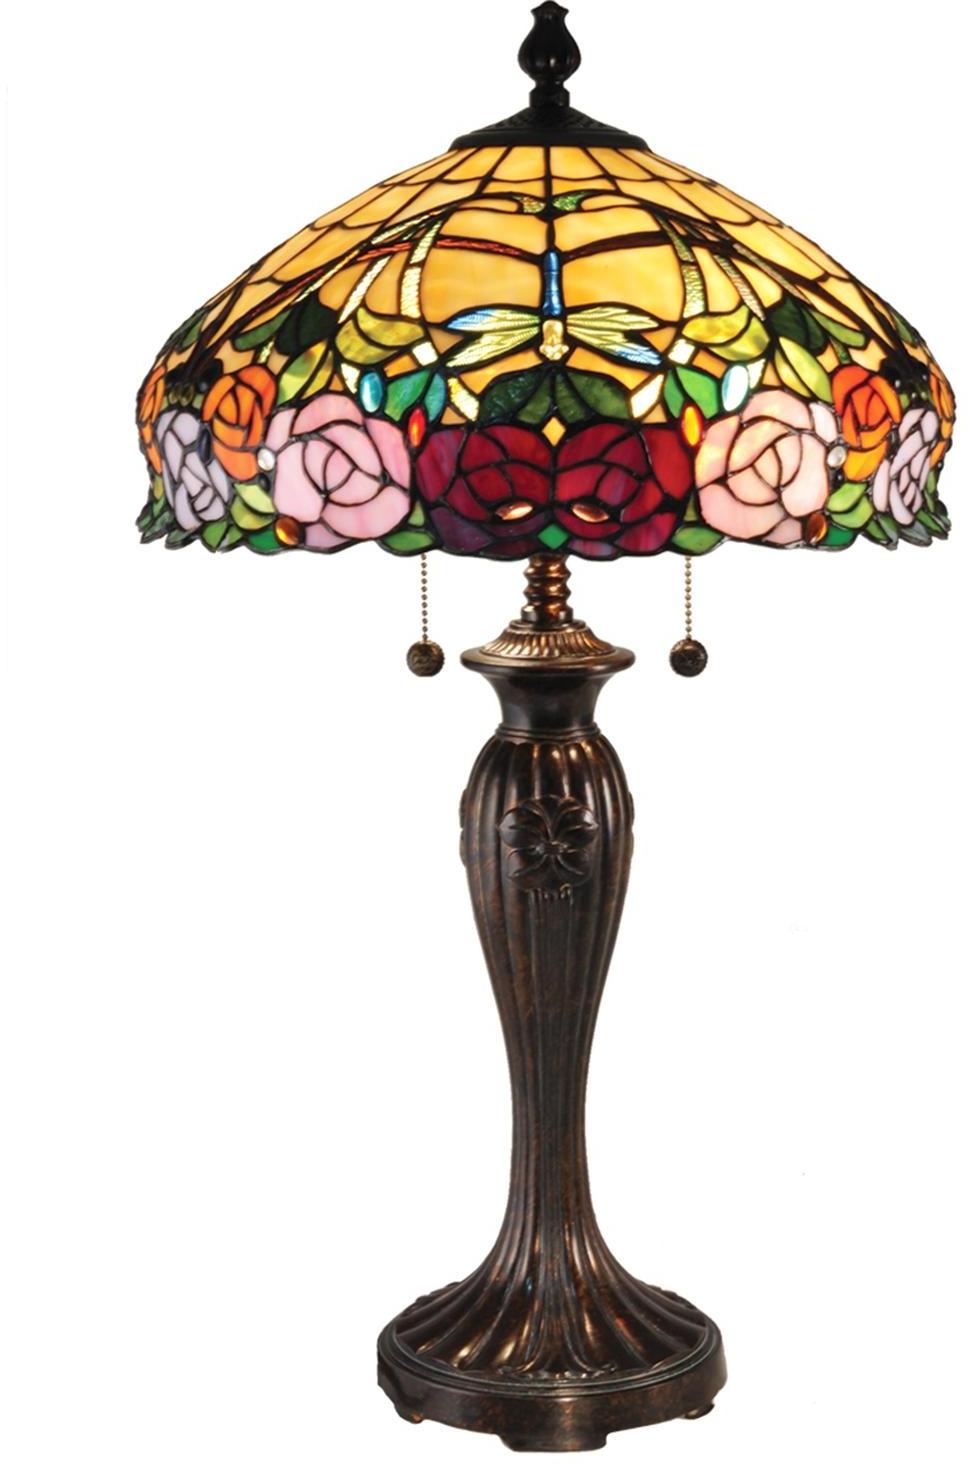 Details About Table Lamp Dale Tiffany Zenia Rose 2 Light Fieldstone Hand Rolled Art Gl